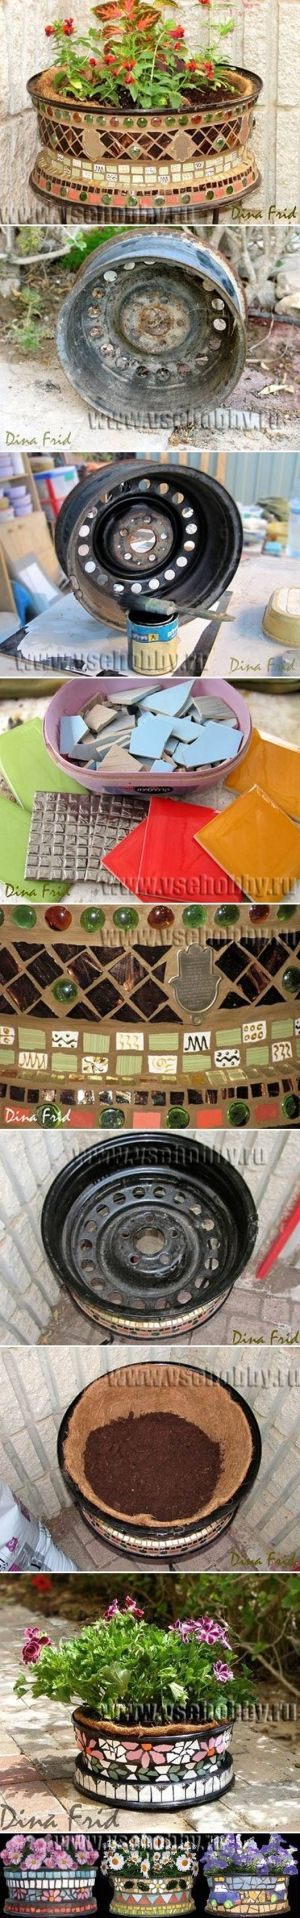 DIY Old Wheel Mosaic Flower Pot DIY Old Wheel Mosaic Flower Pot by diyforever